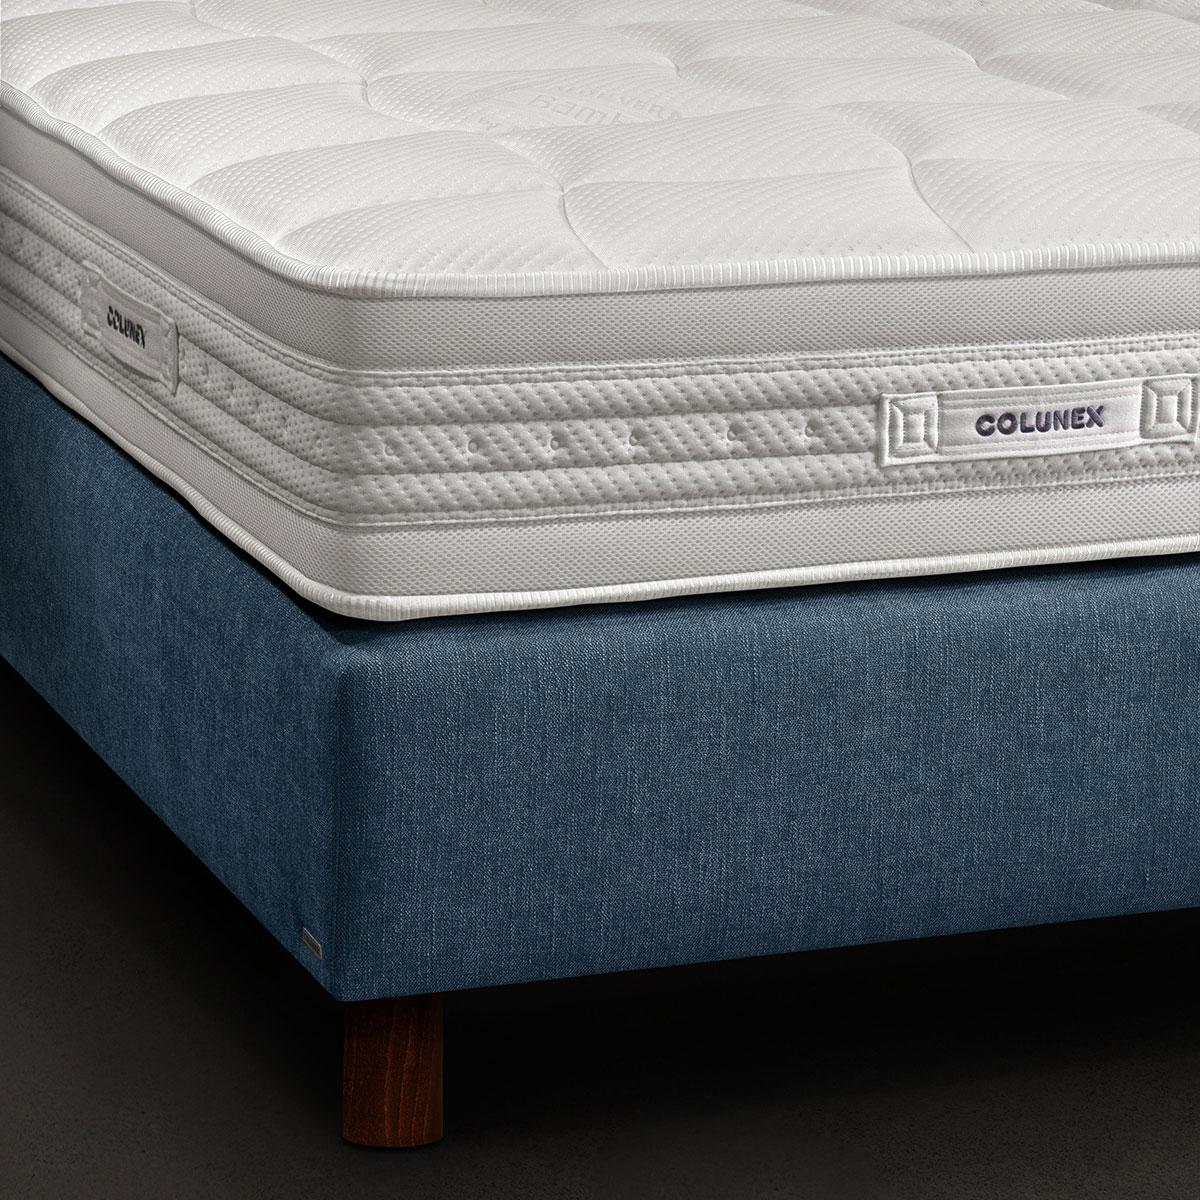 best eco Best Eco colunex best eco mattress 01 3